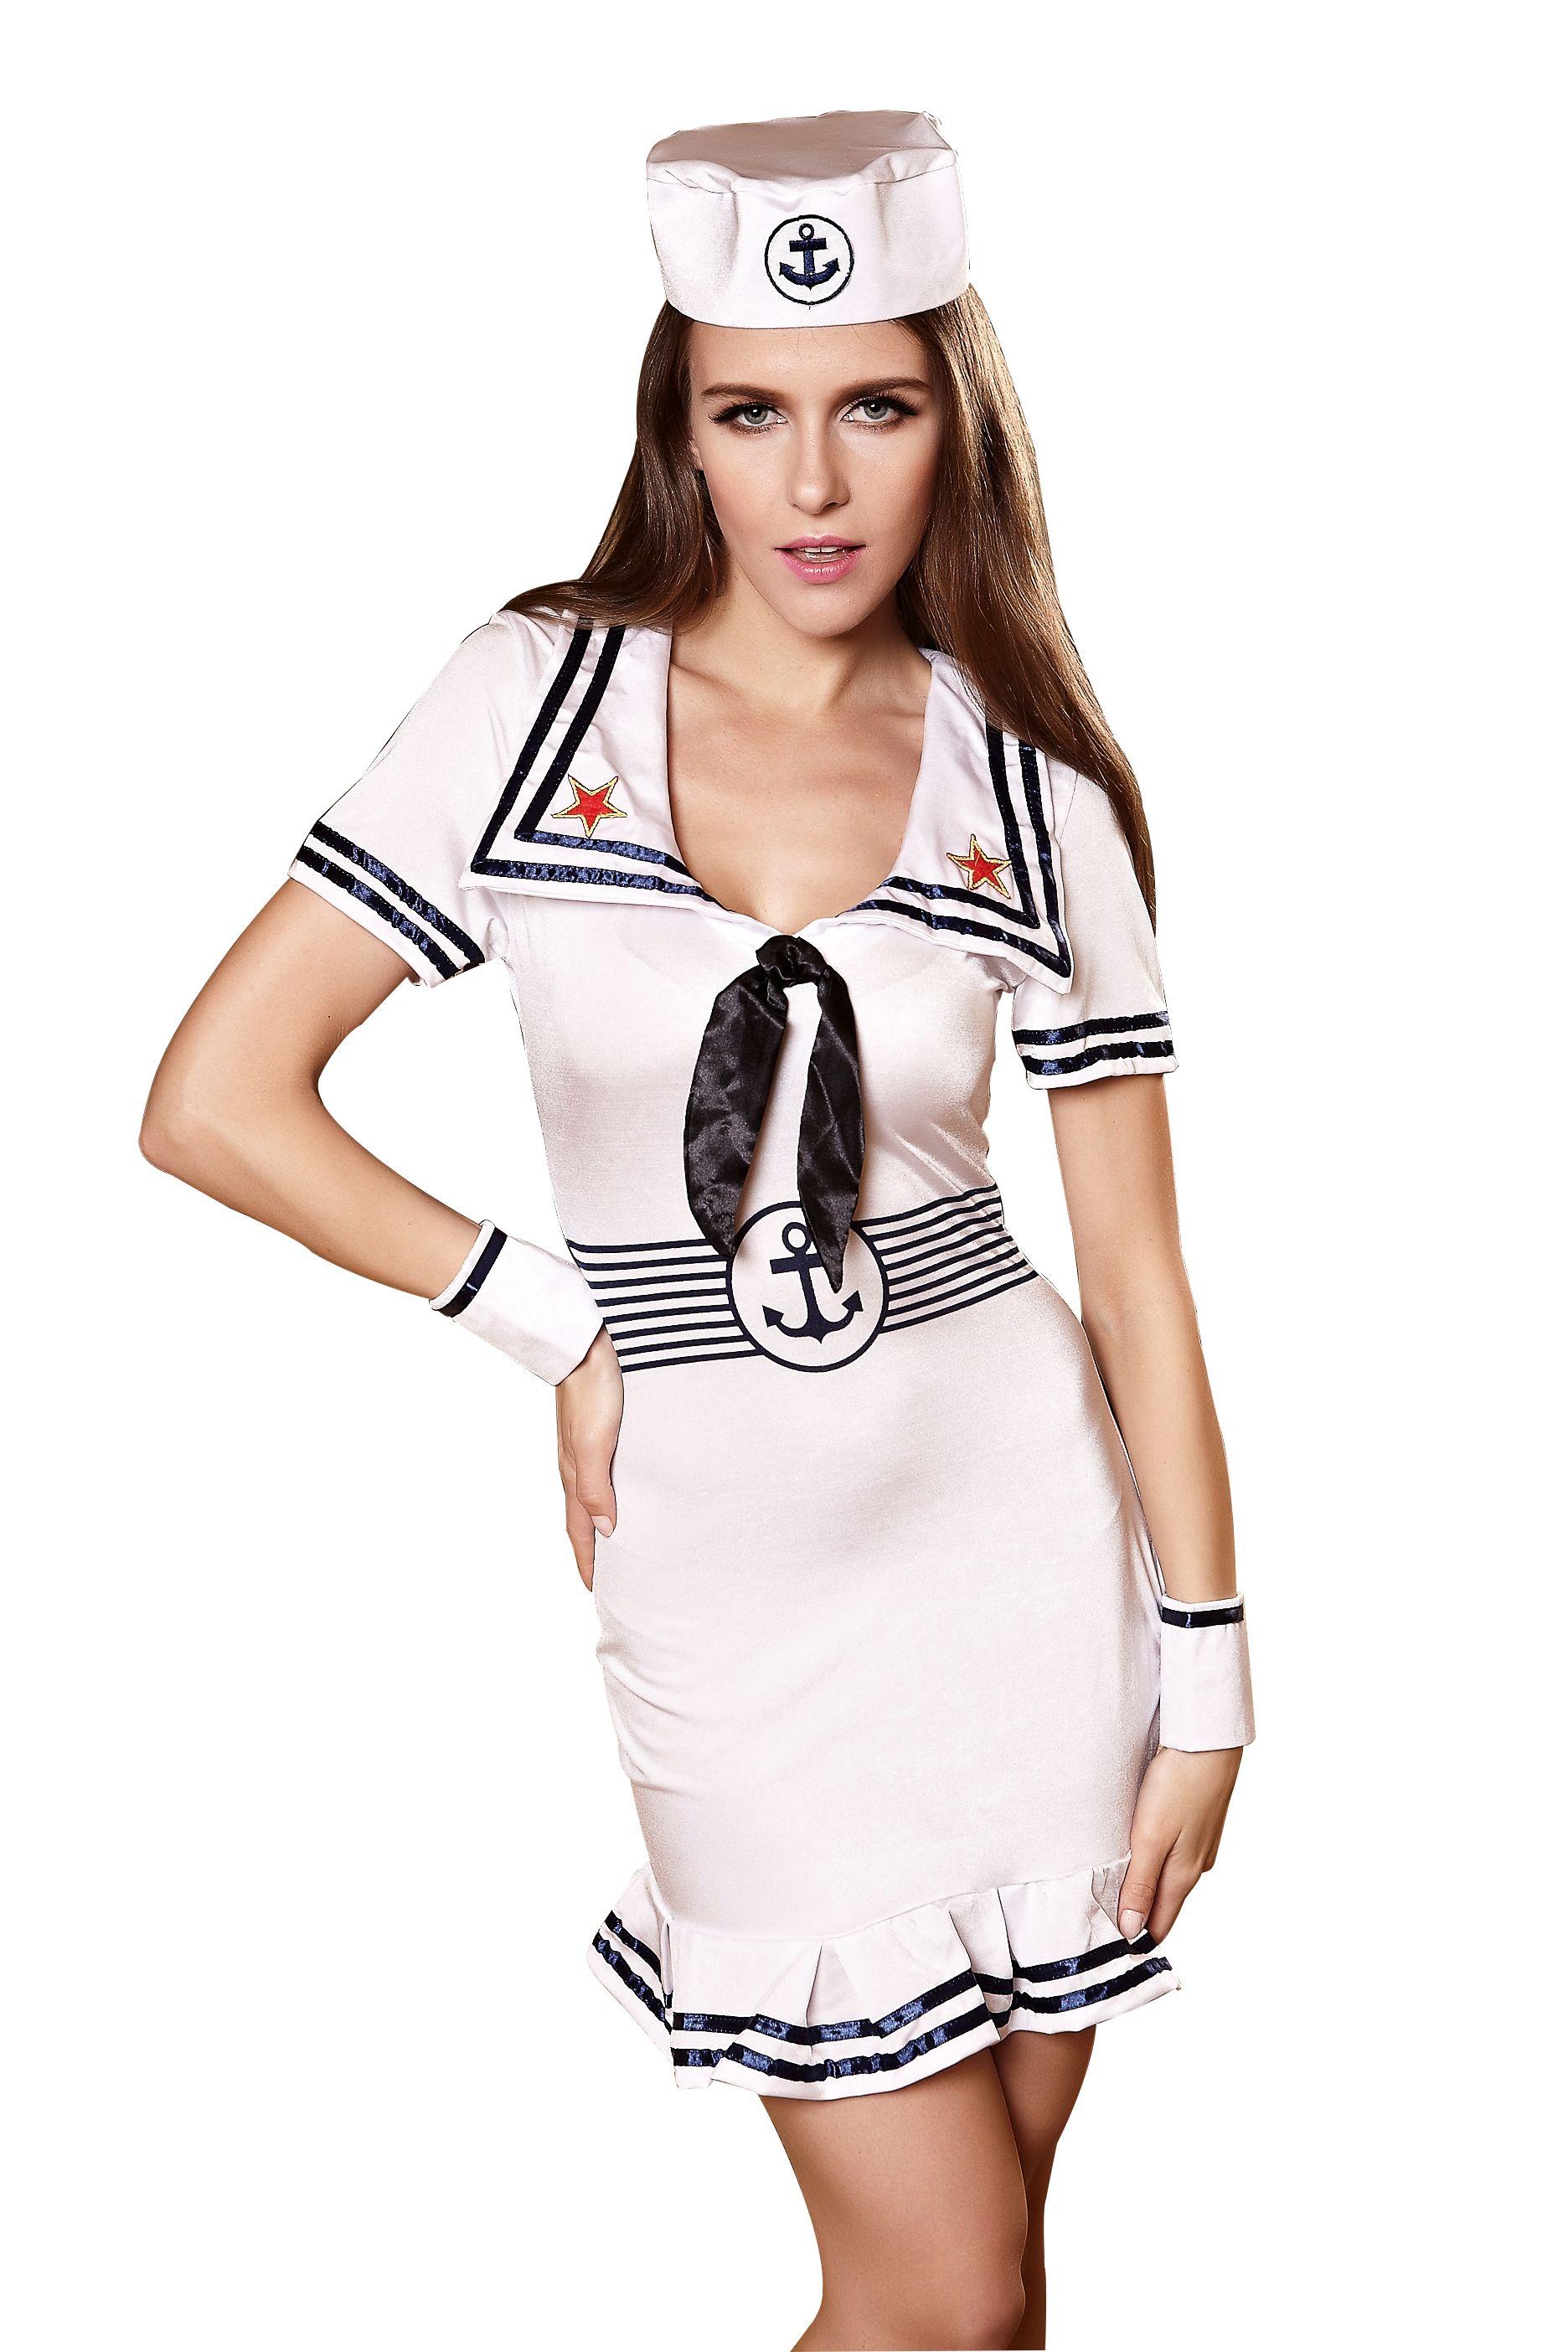 2017 Sexy Lingerie For Women Navy Sailor Uniform For Female Adult ...